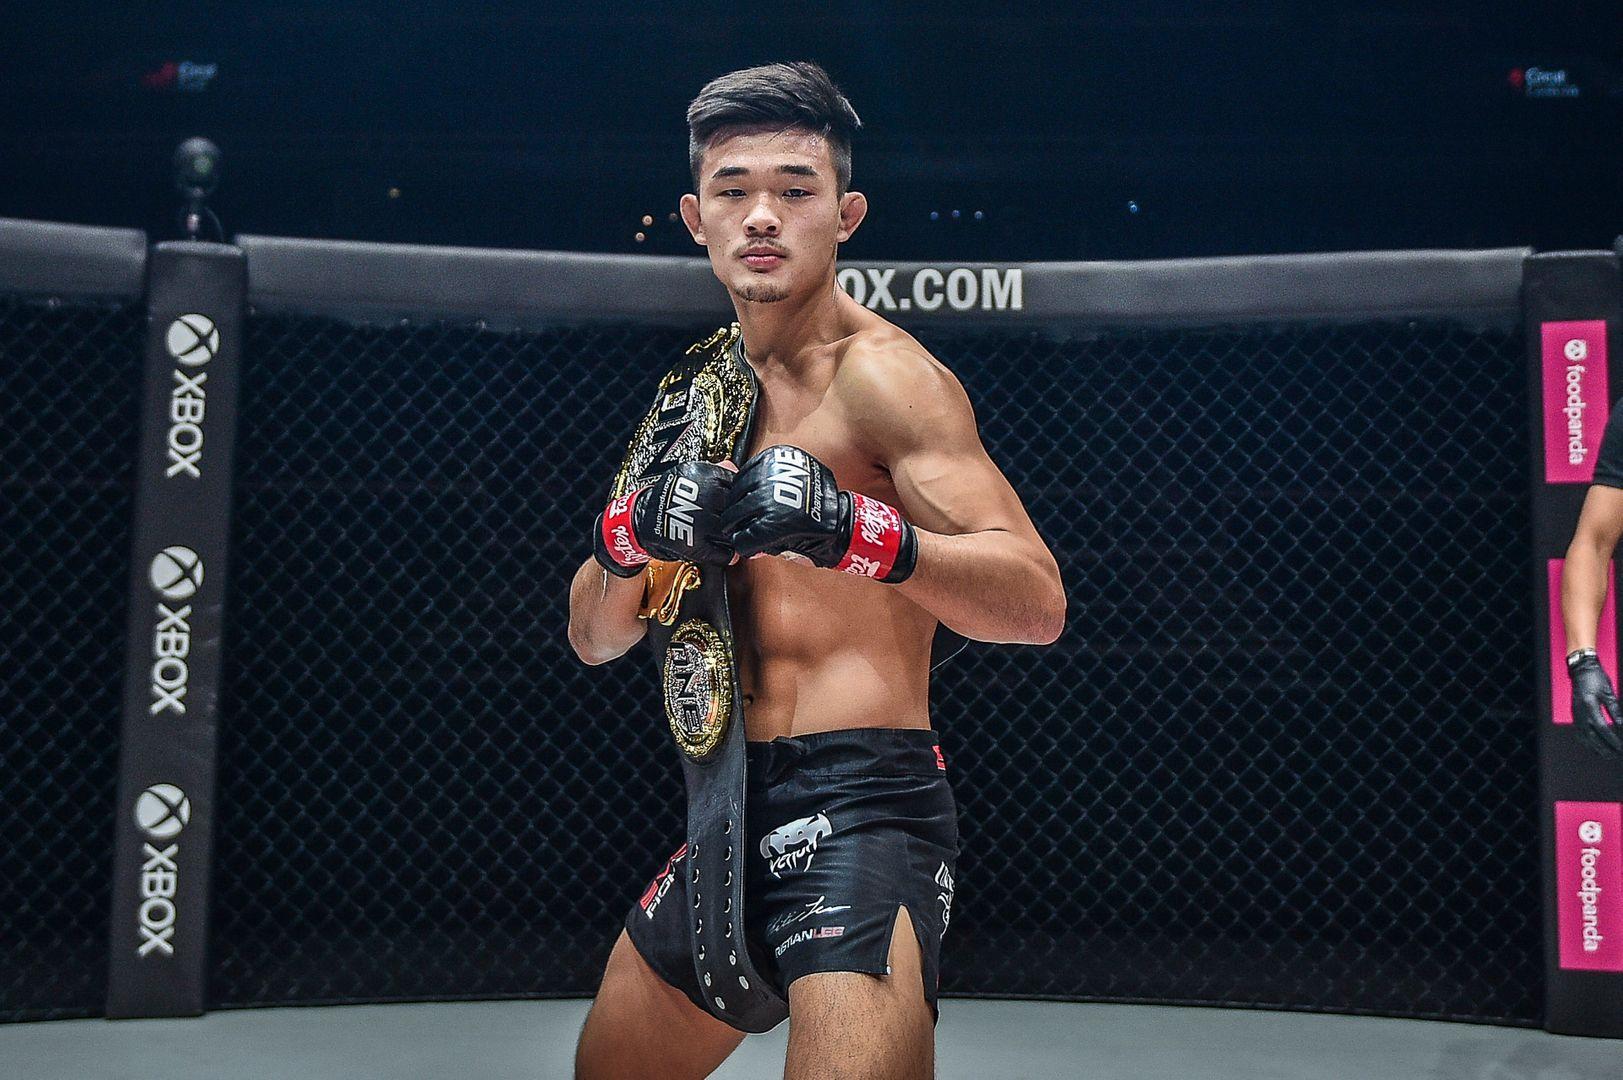 ONE World Champ Christian Lee Vs. Nastyukhin: 'I'm Going To Break Him Down With My Pressure' - lee